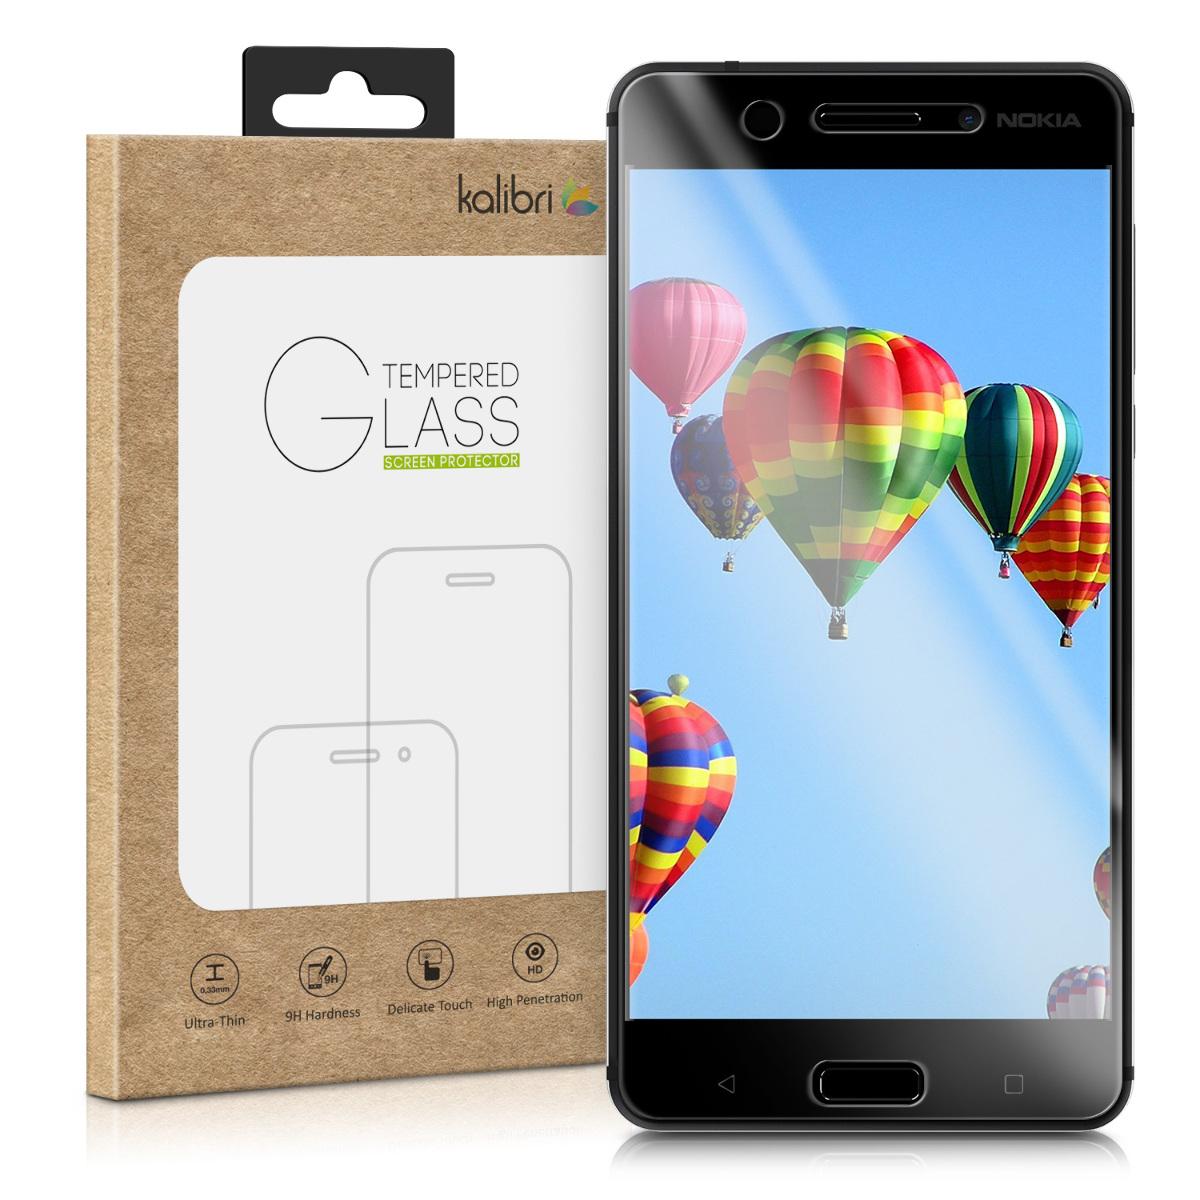 Kalibri Tempered Glass - Fullface Αντιχαρακτικό Γυαλί Οθόνης Nokia 5 - Black Frame (42886.01)